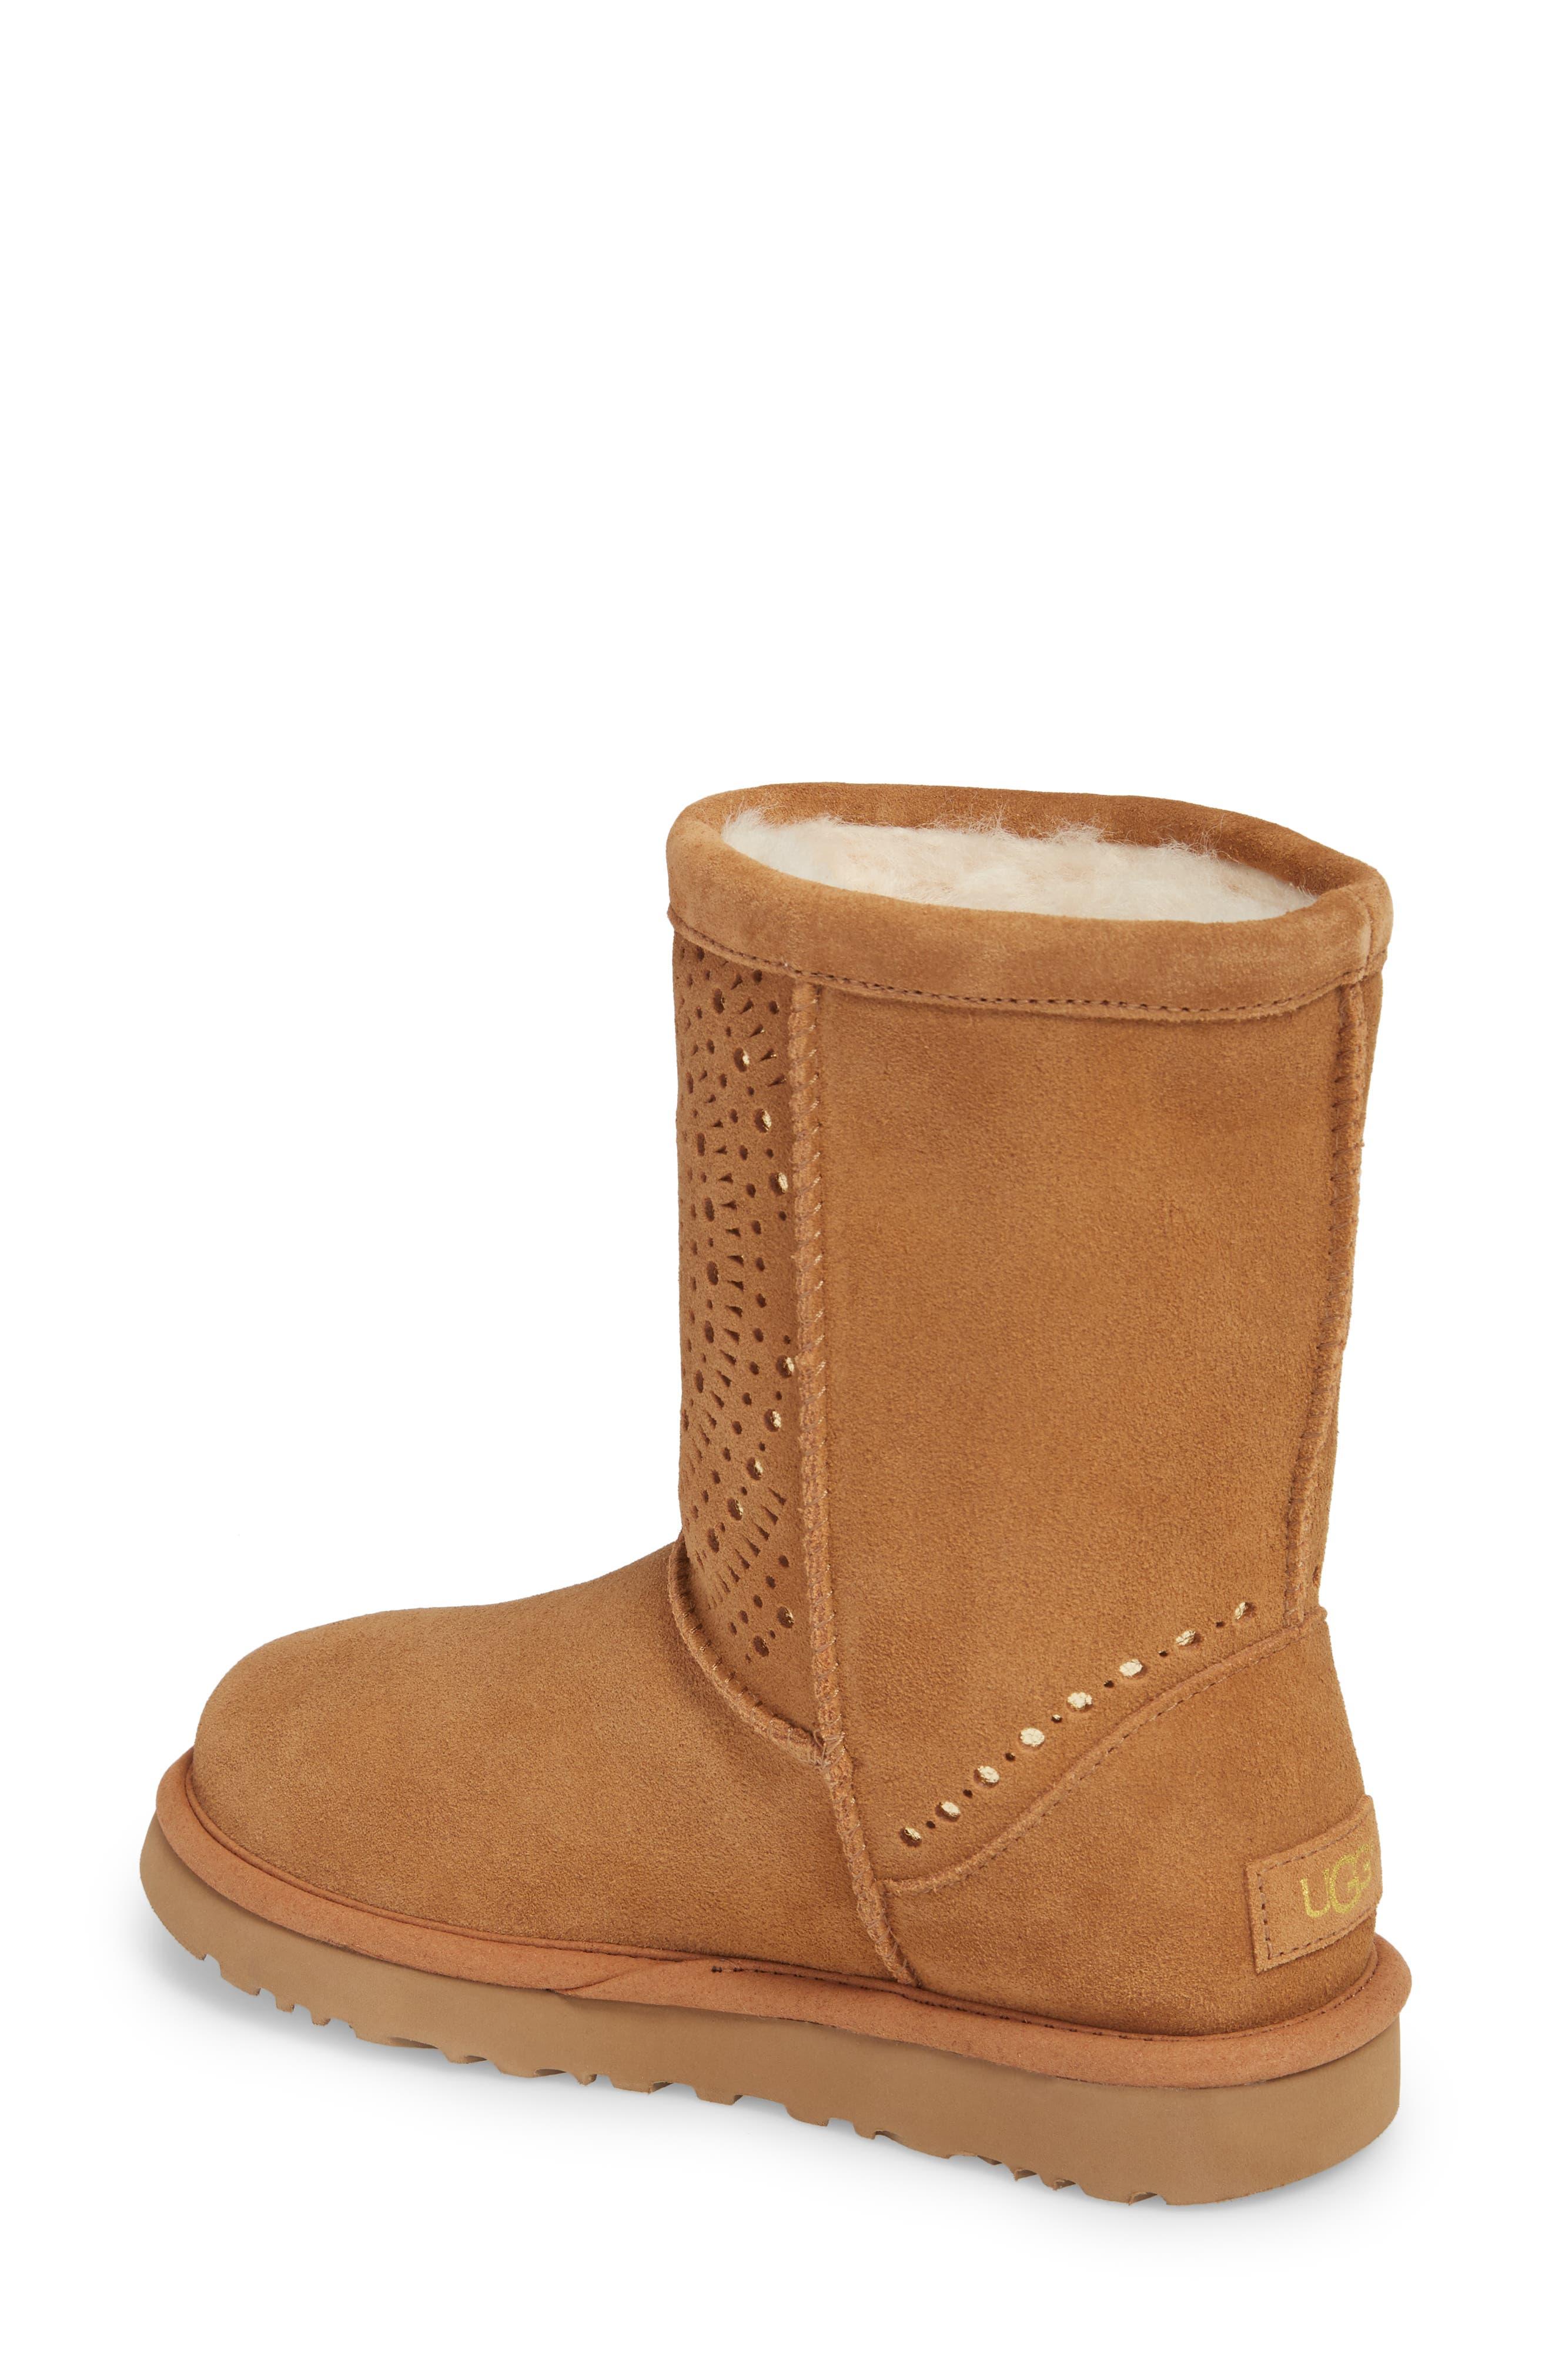 Alternate Image 2  - UGG® Classic Short Sunshine Perforated Boot (Women)